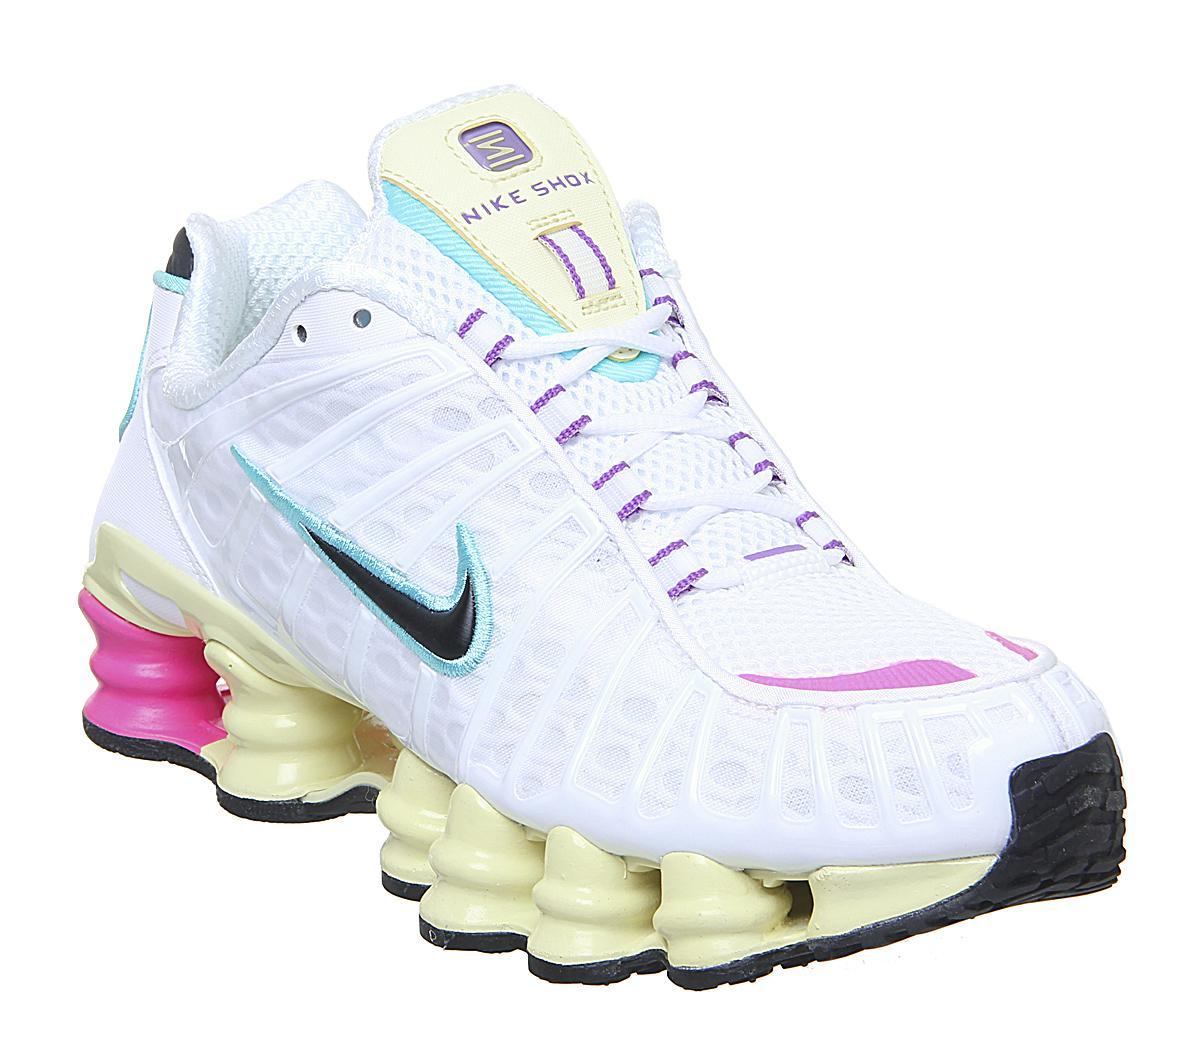 Nike Nike Shox Tl Trainers White Black